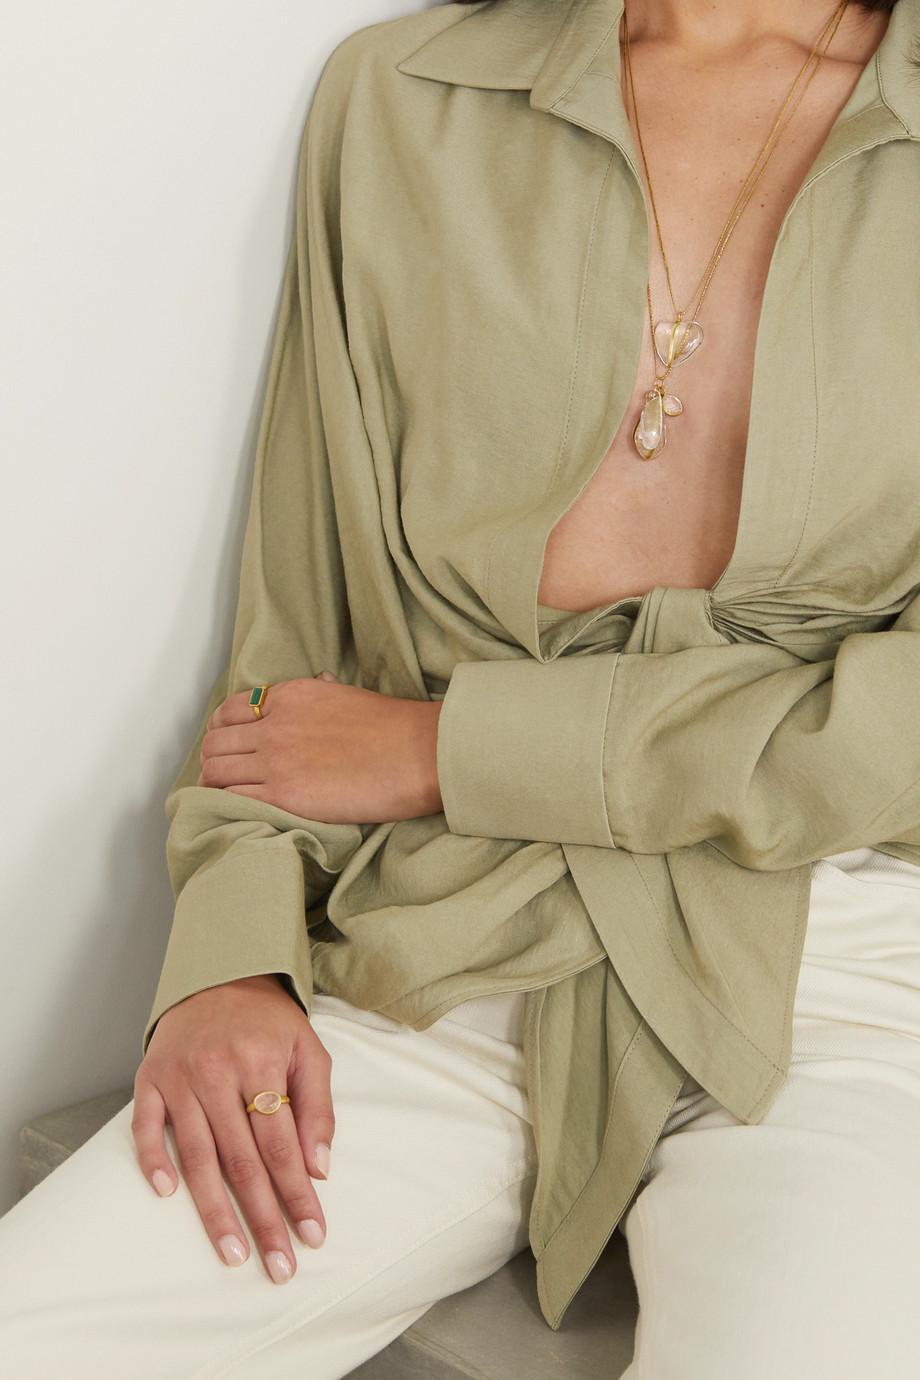 Pippa Small 18-karat gold, cord and quartz necklace